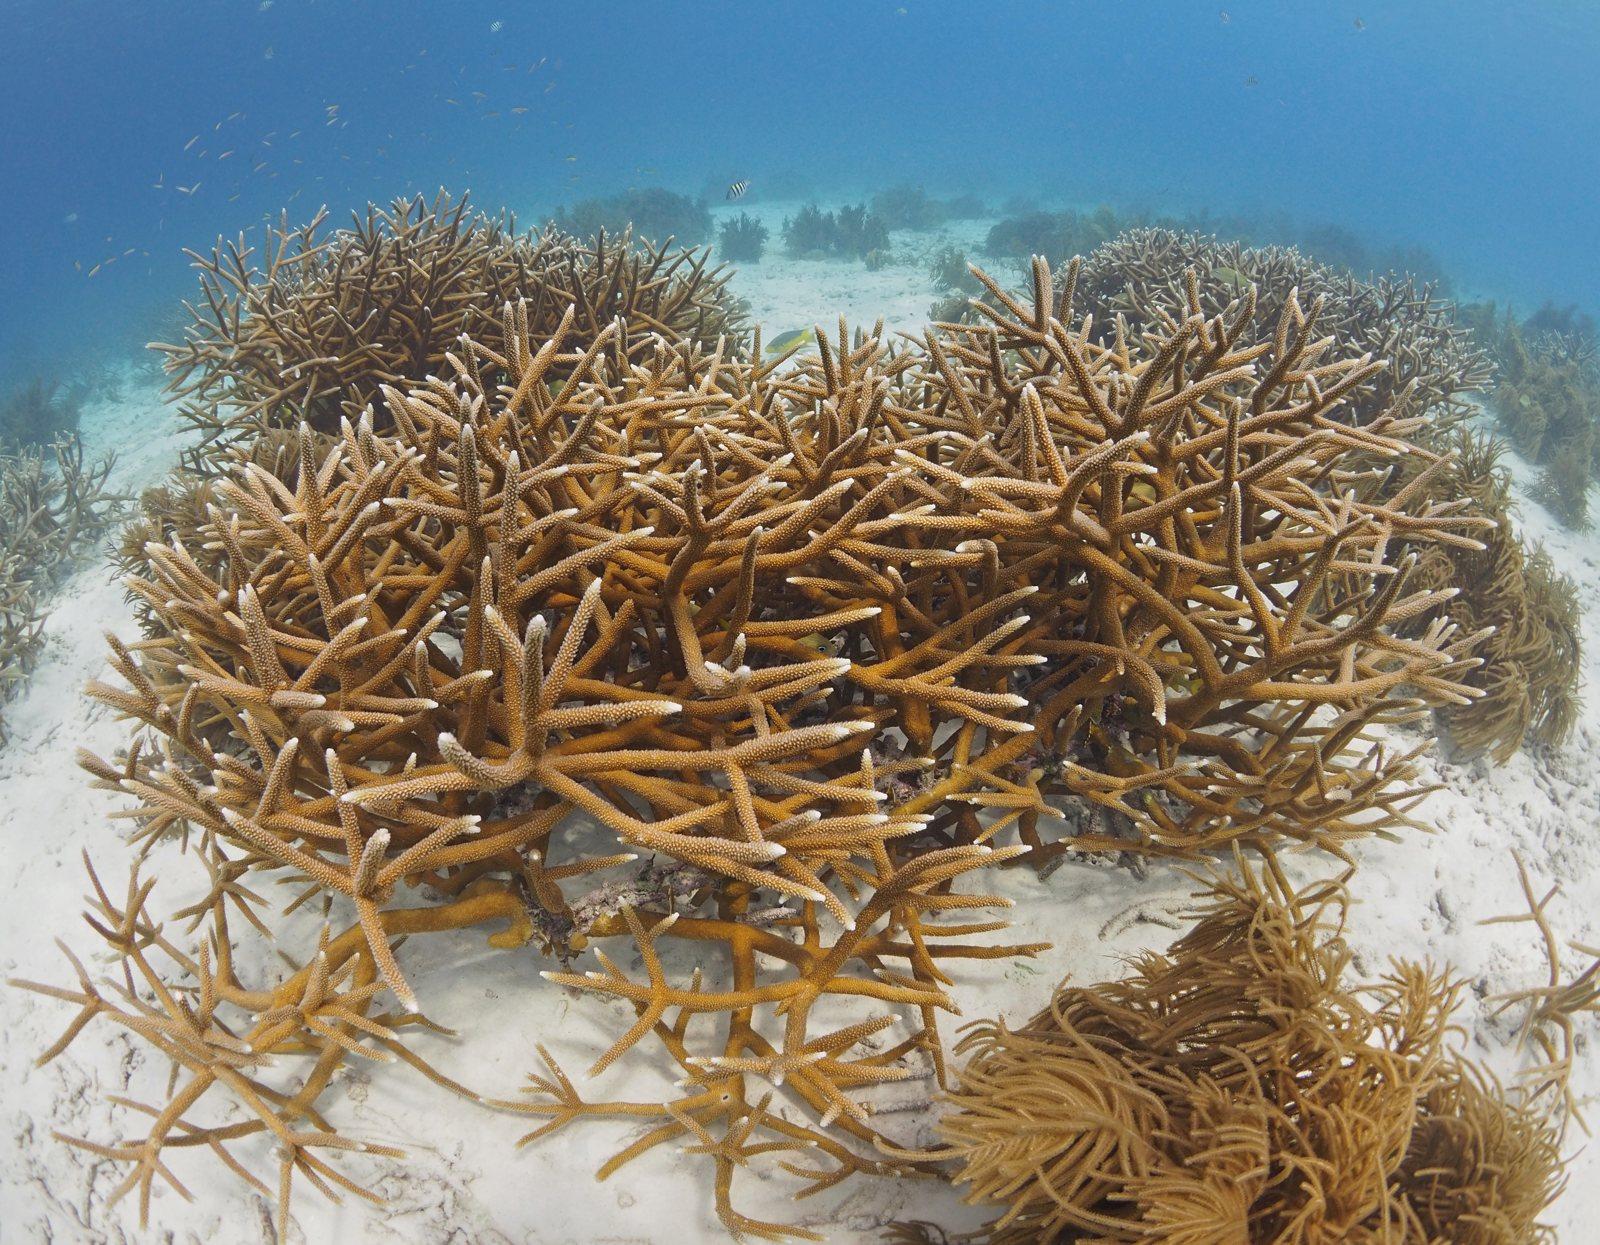 Reef Bonaire restoration